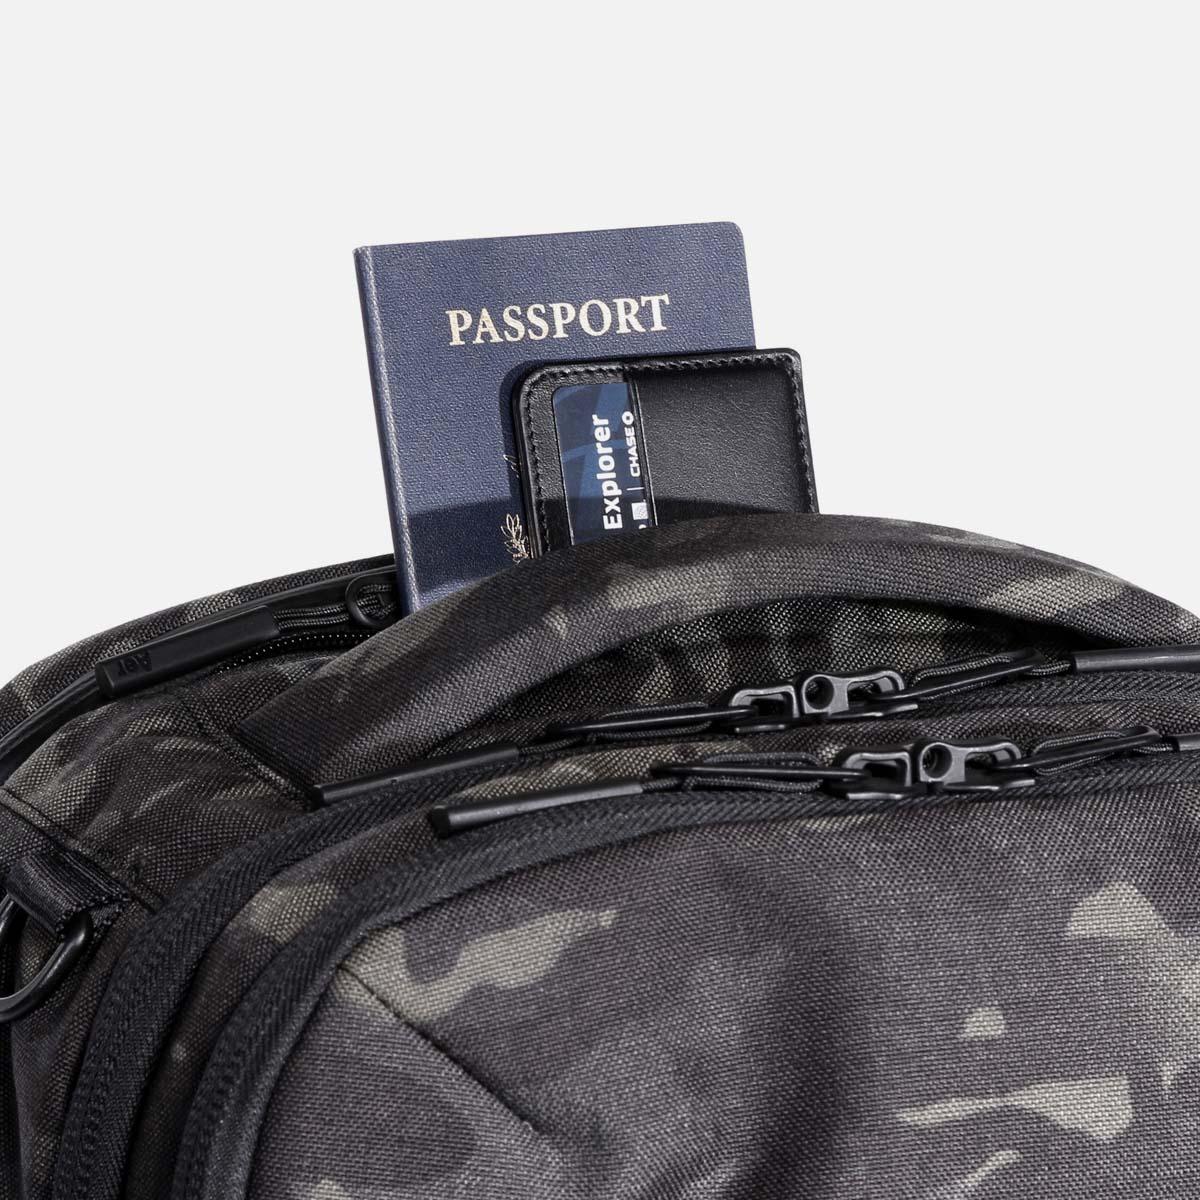 24007_tp2_blackcamo_passport.jpg